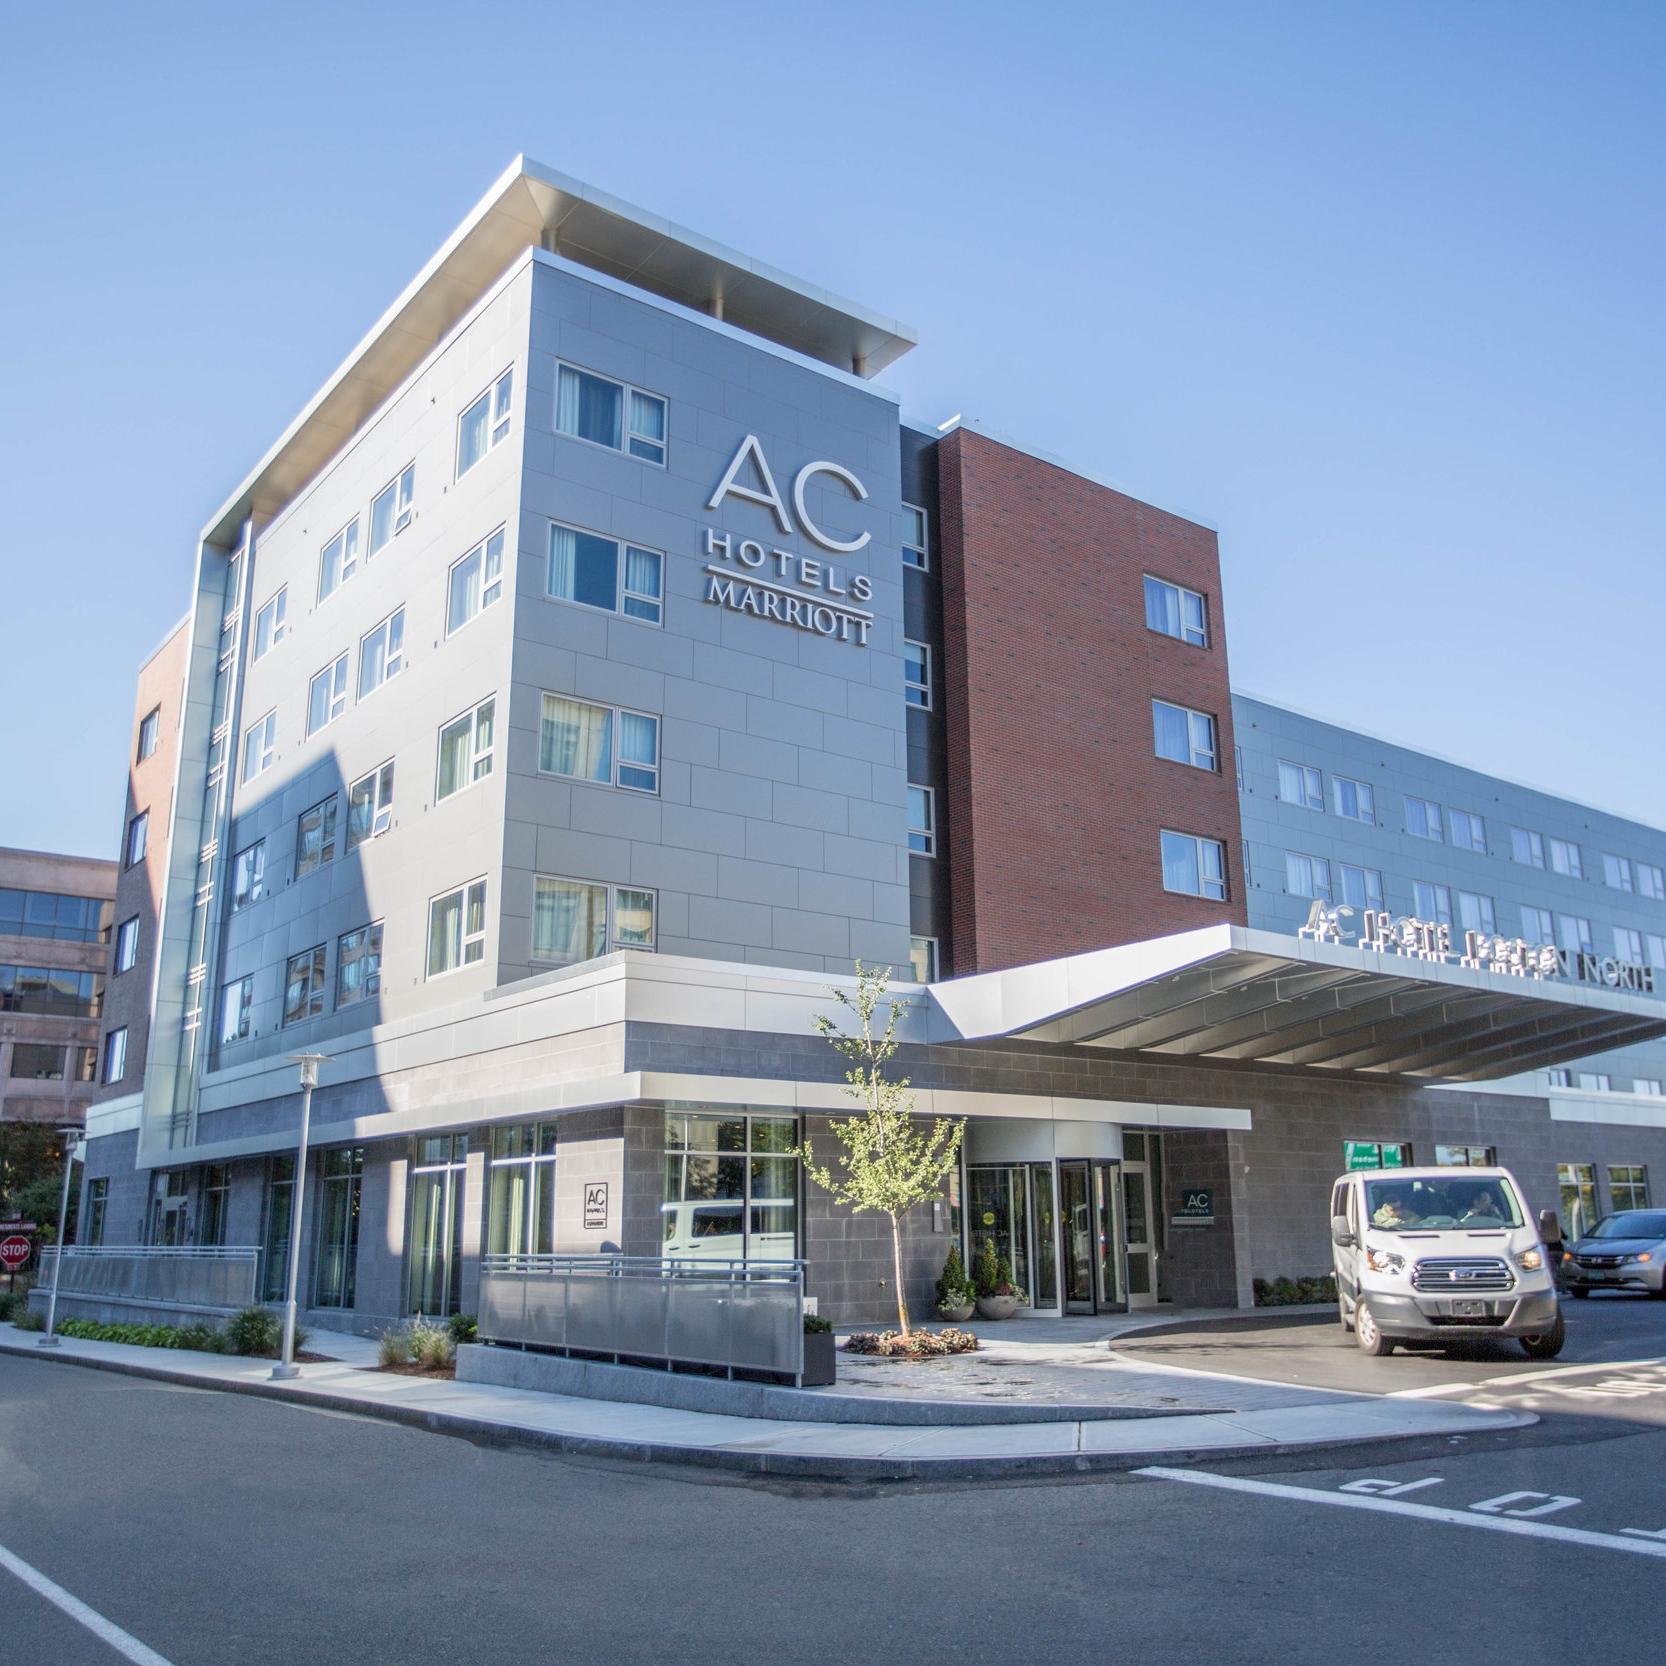 AC Hotel by Marriott   82,682 Square Feet AC Brand Hotel Contractor: ProCon Boston, Massachusetts